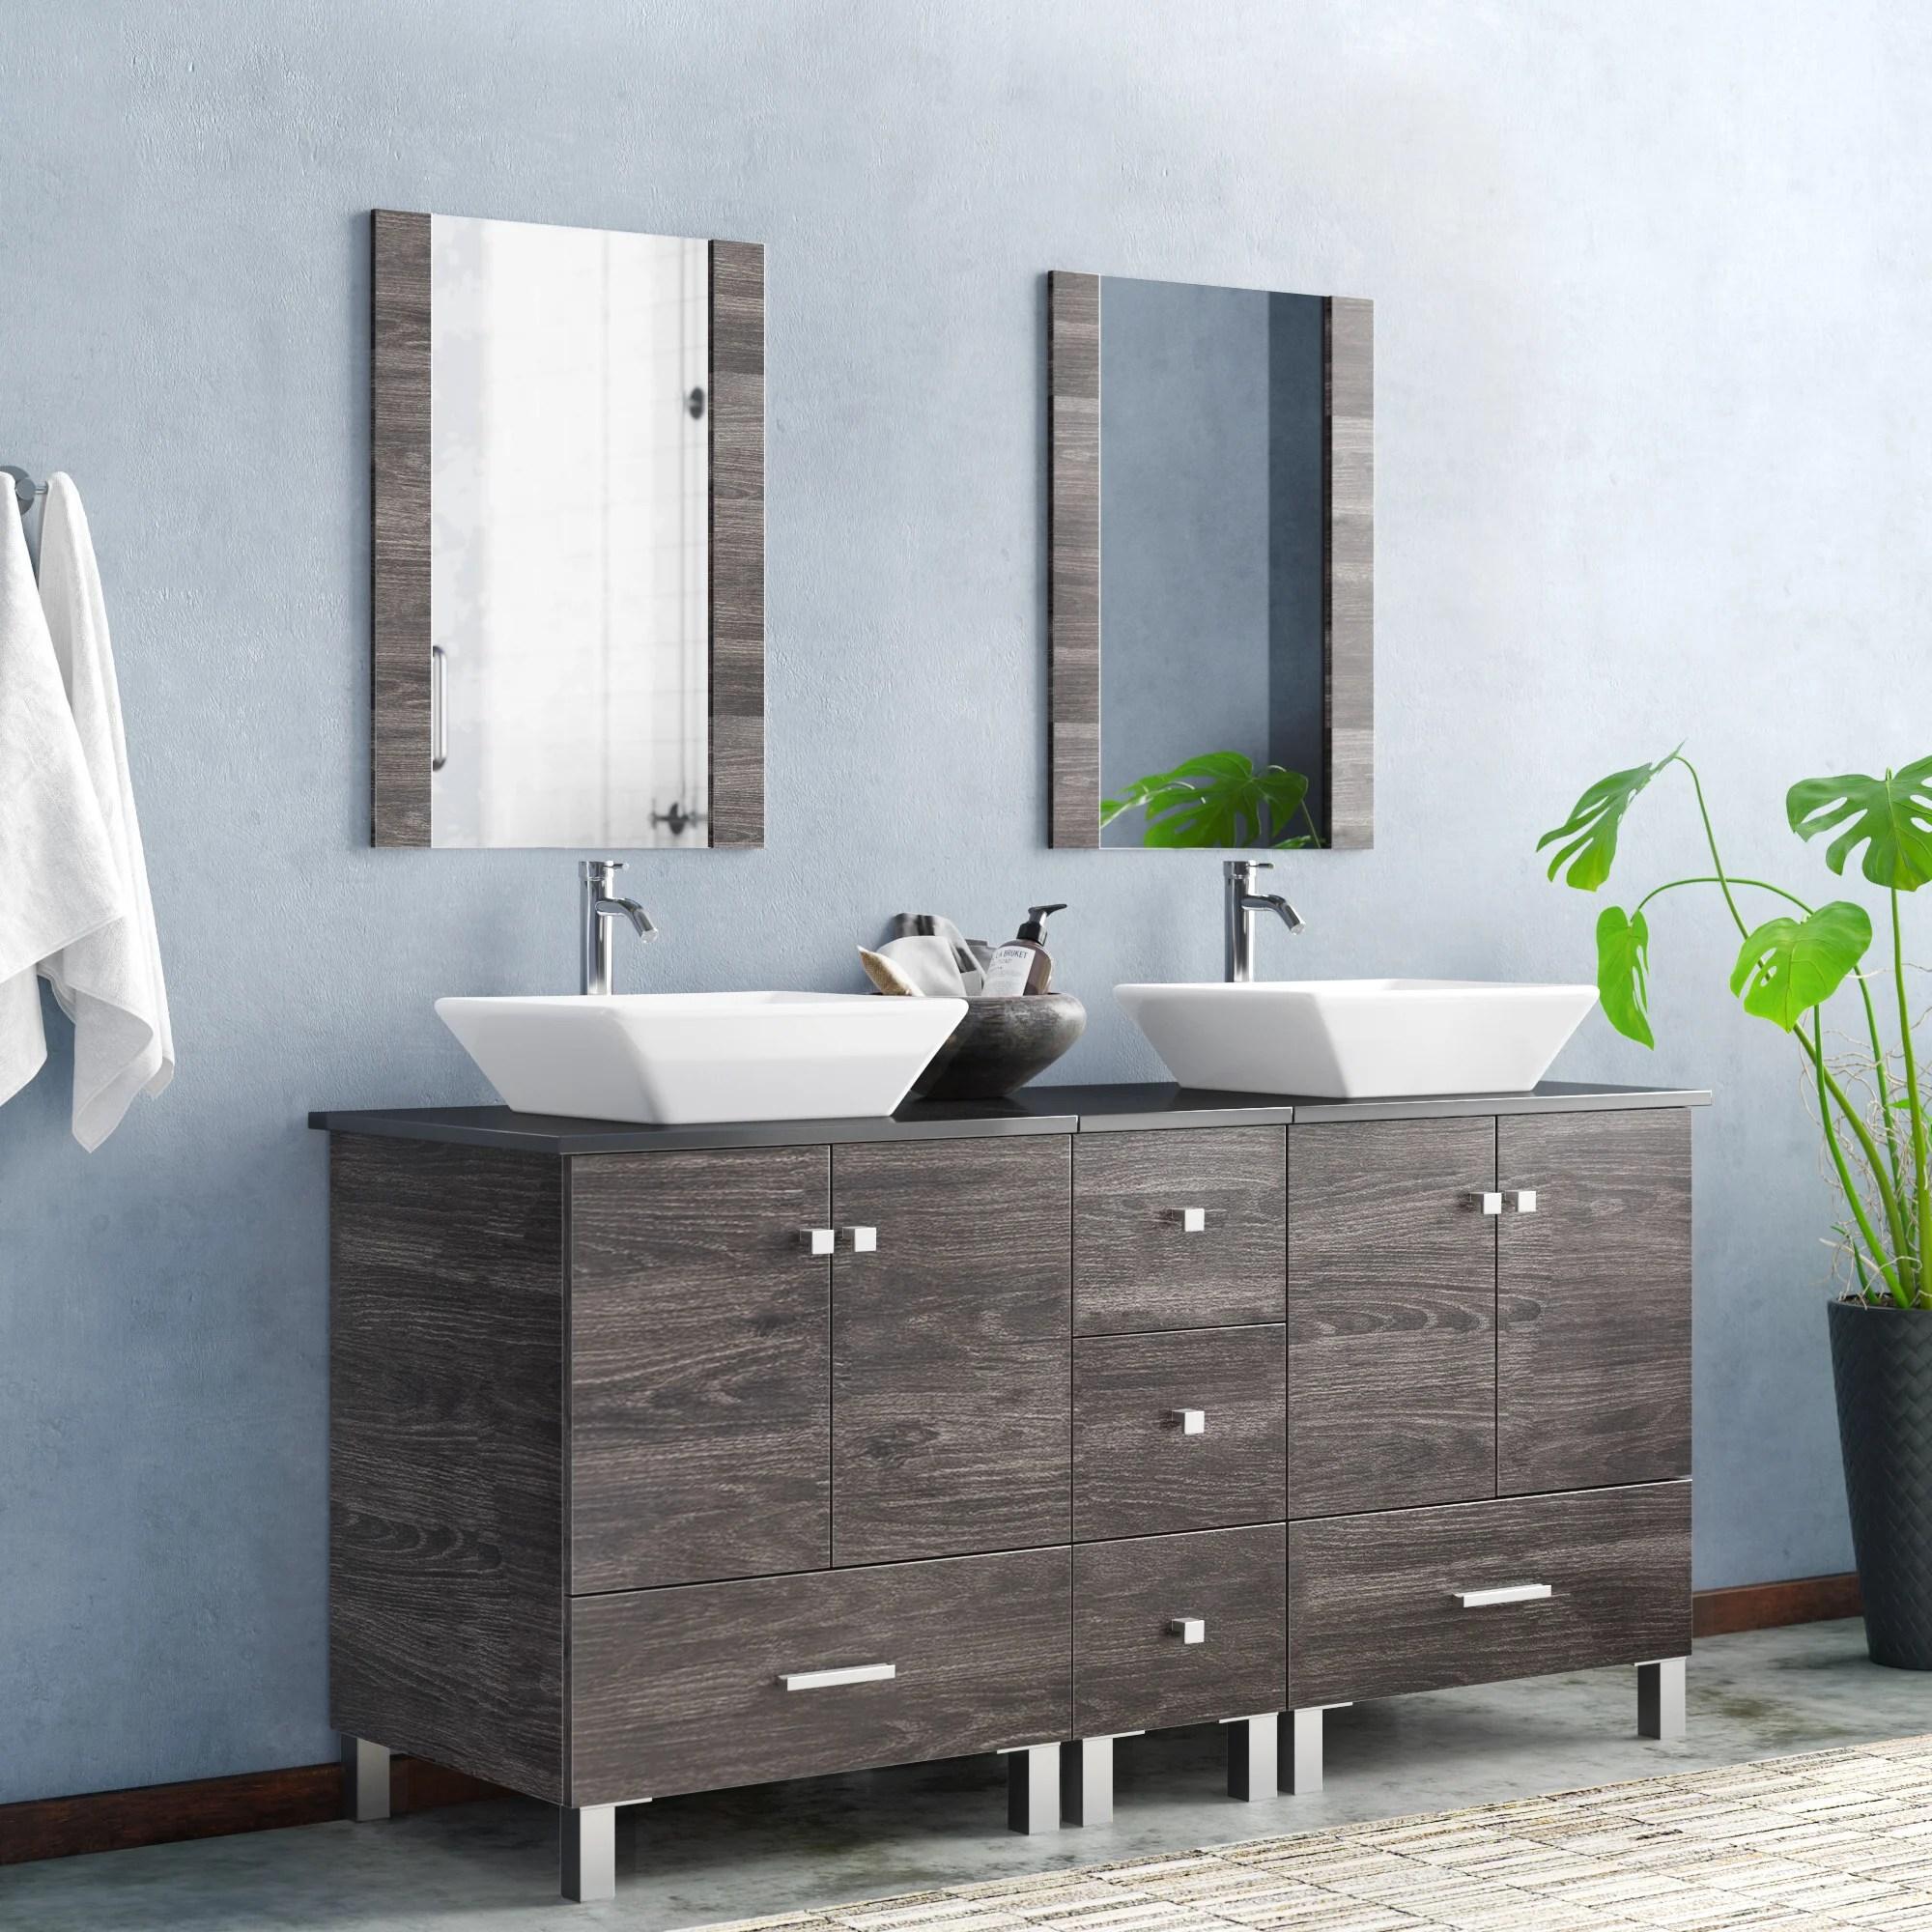 barbonne 60 double bathroom vanity with mirror